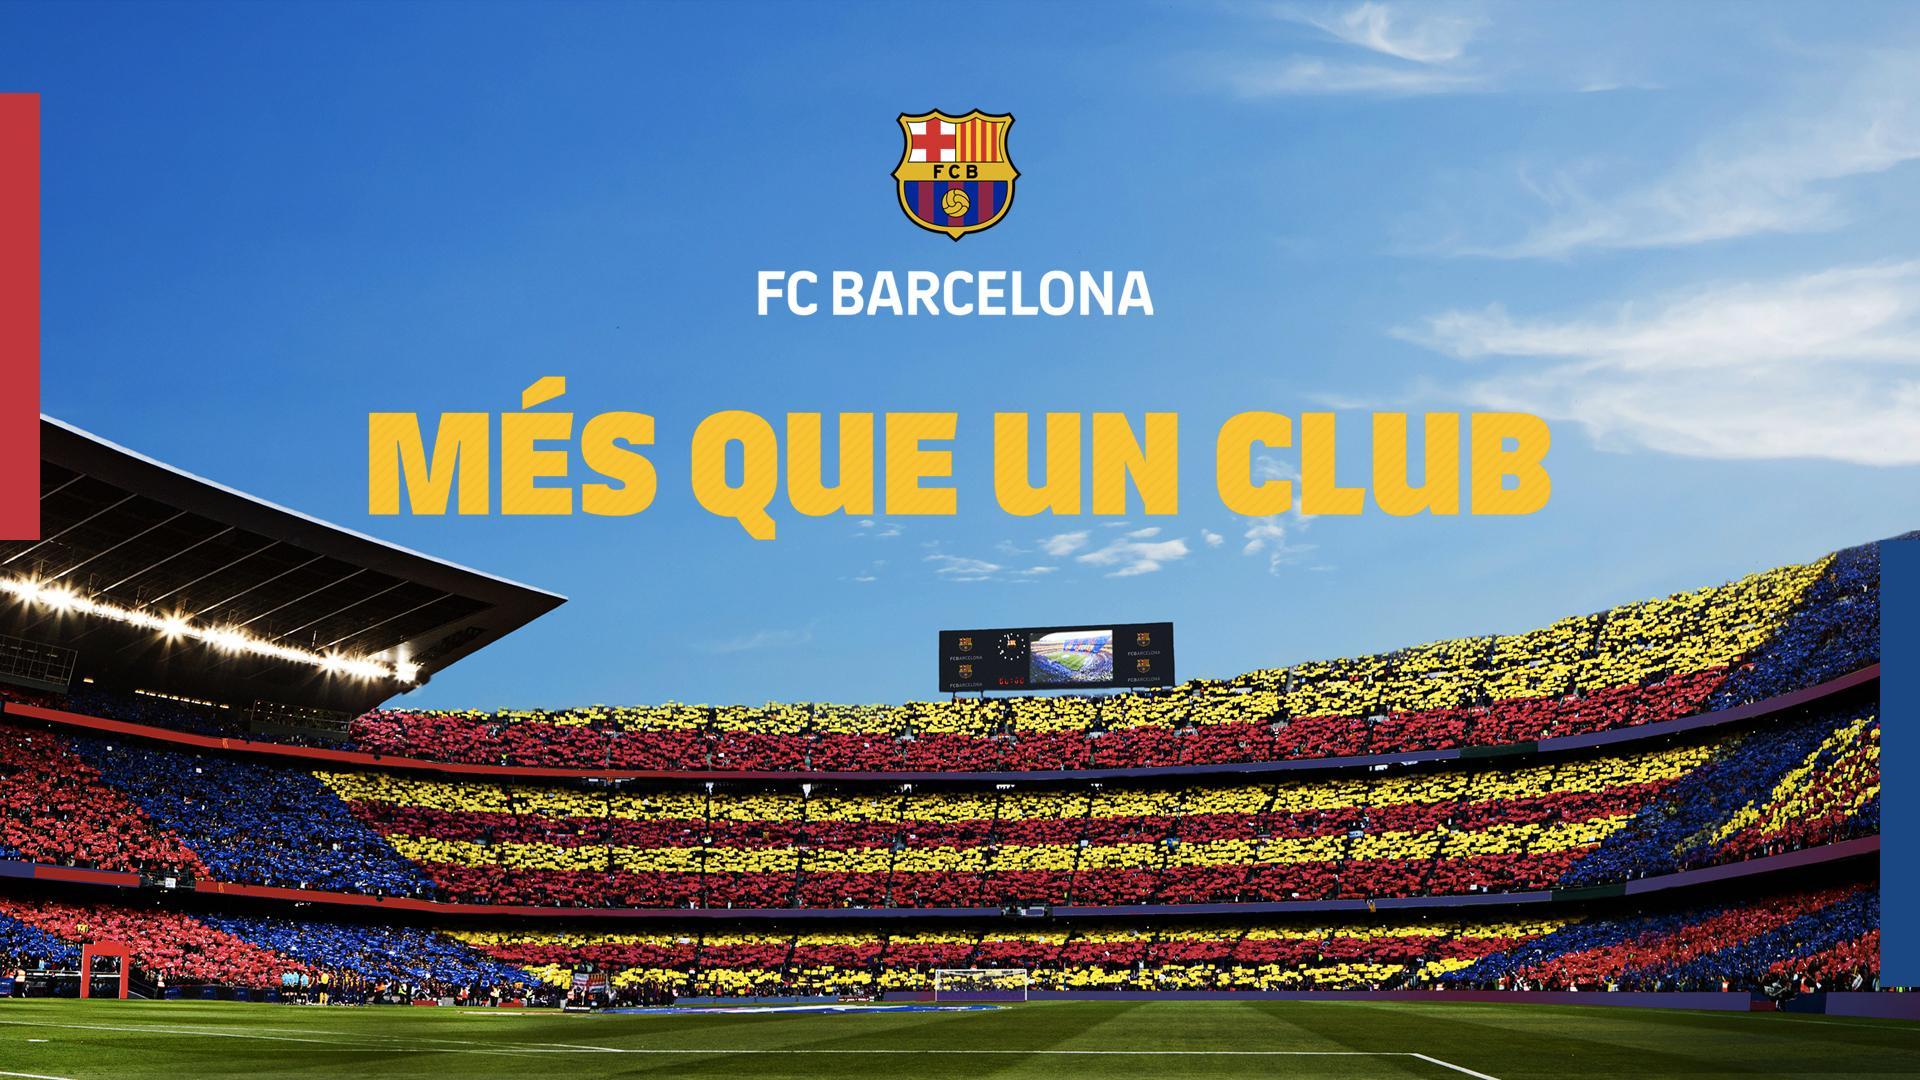 1920x1080px FC Barcelona 2019 Wallpapers - WallpaperSafari